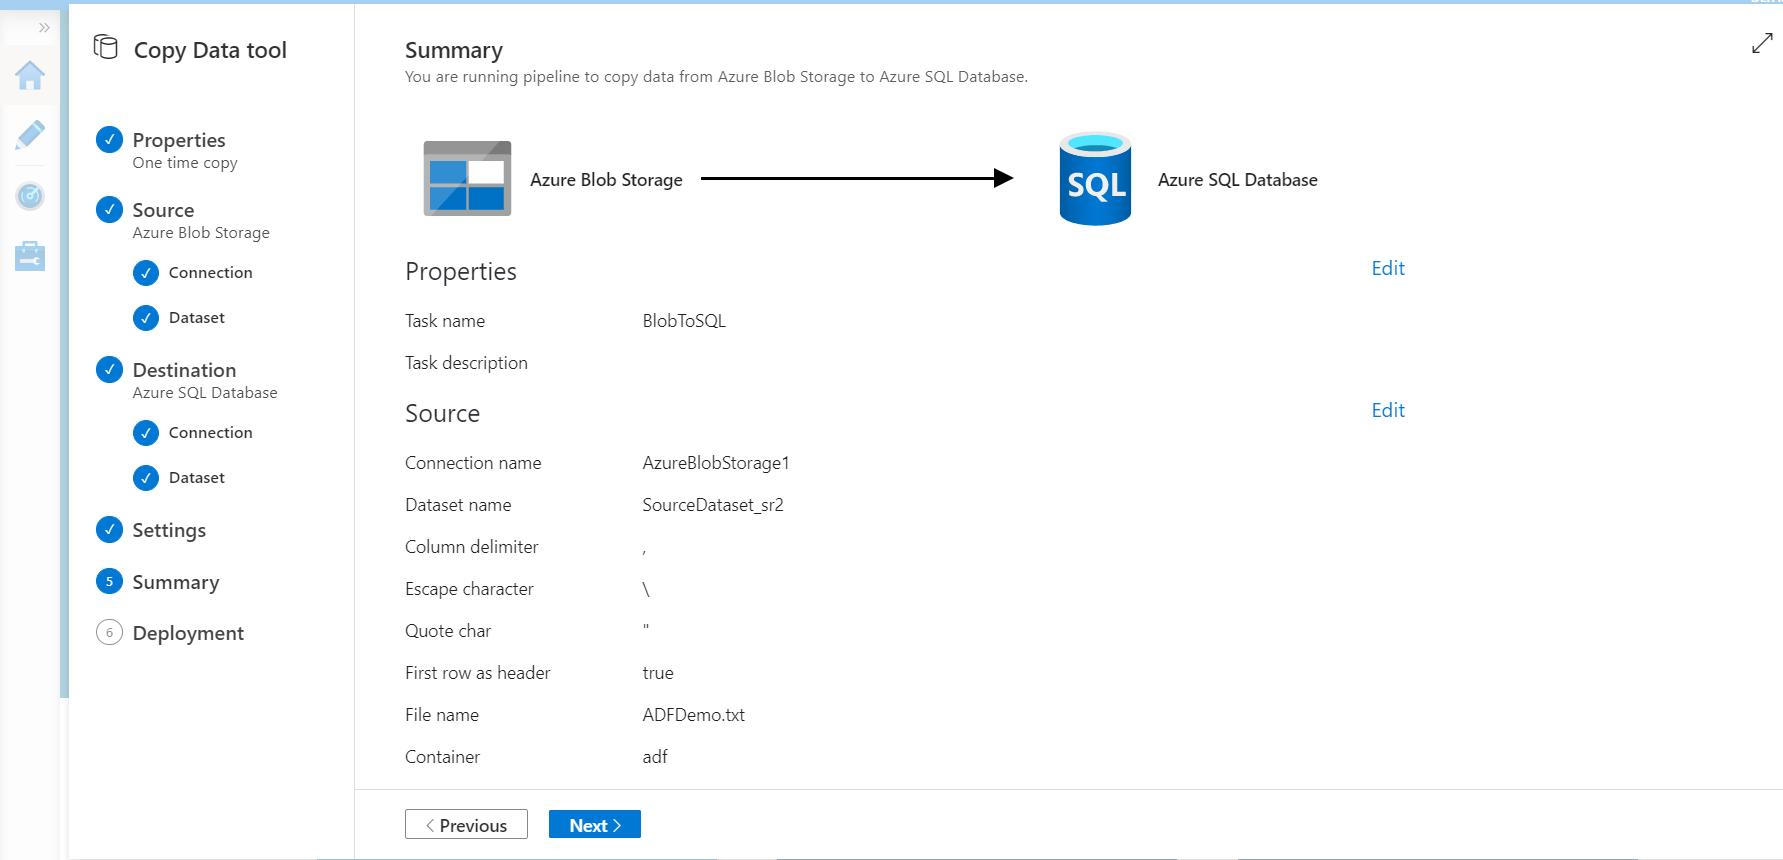 Copy Data Between Azure Data Stores Using Azure Data Factory